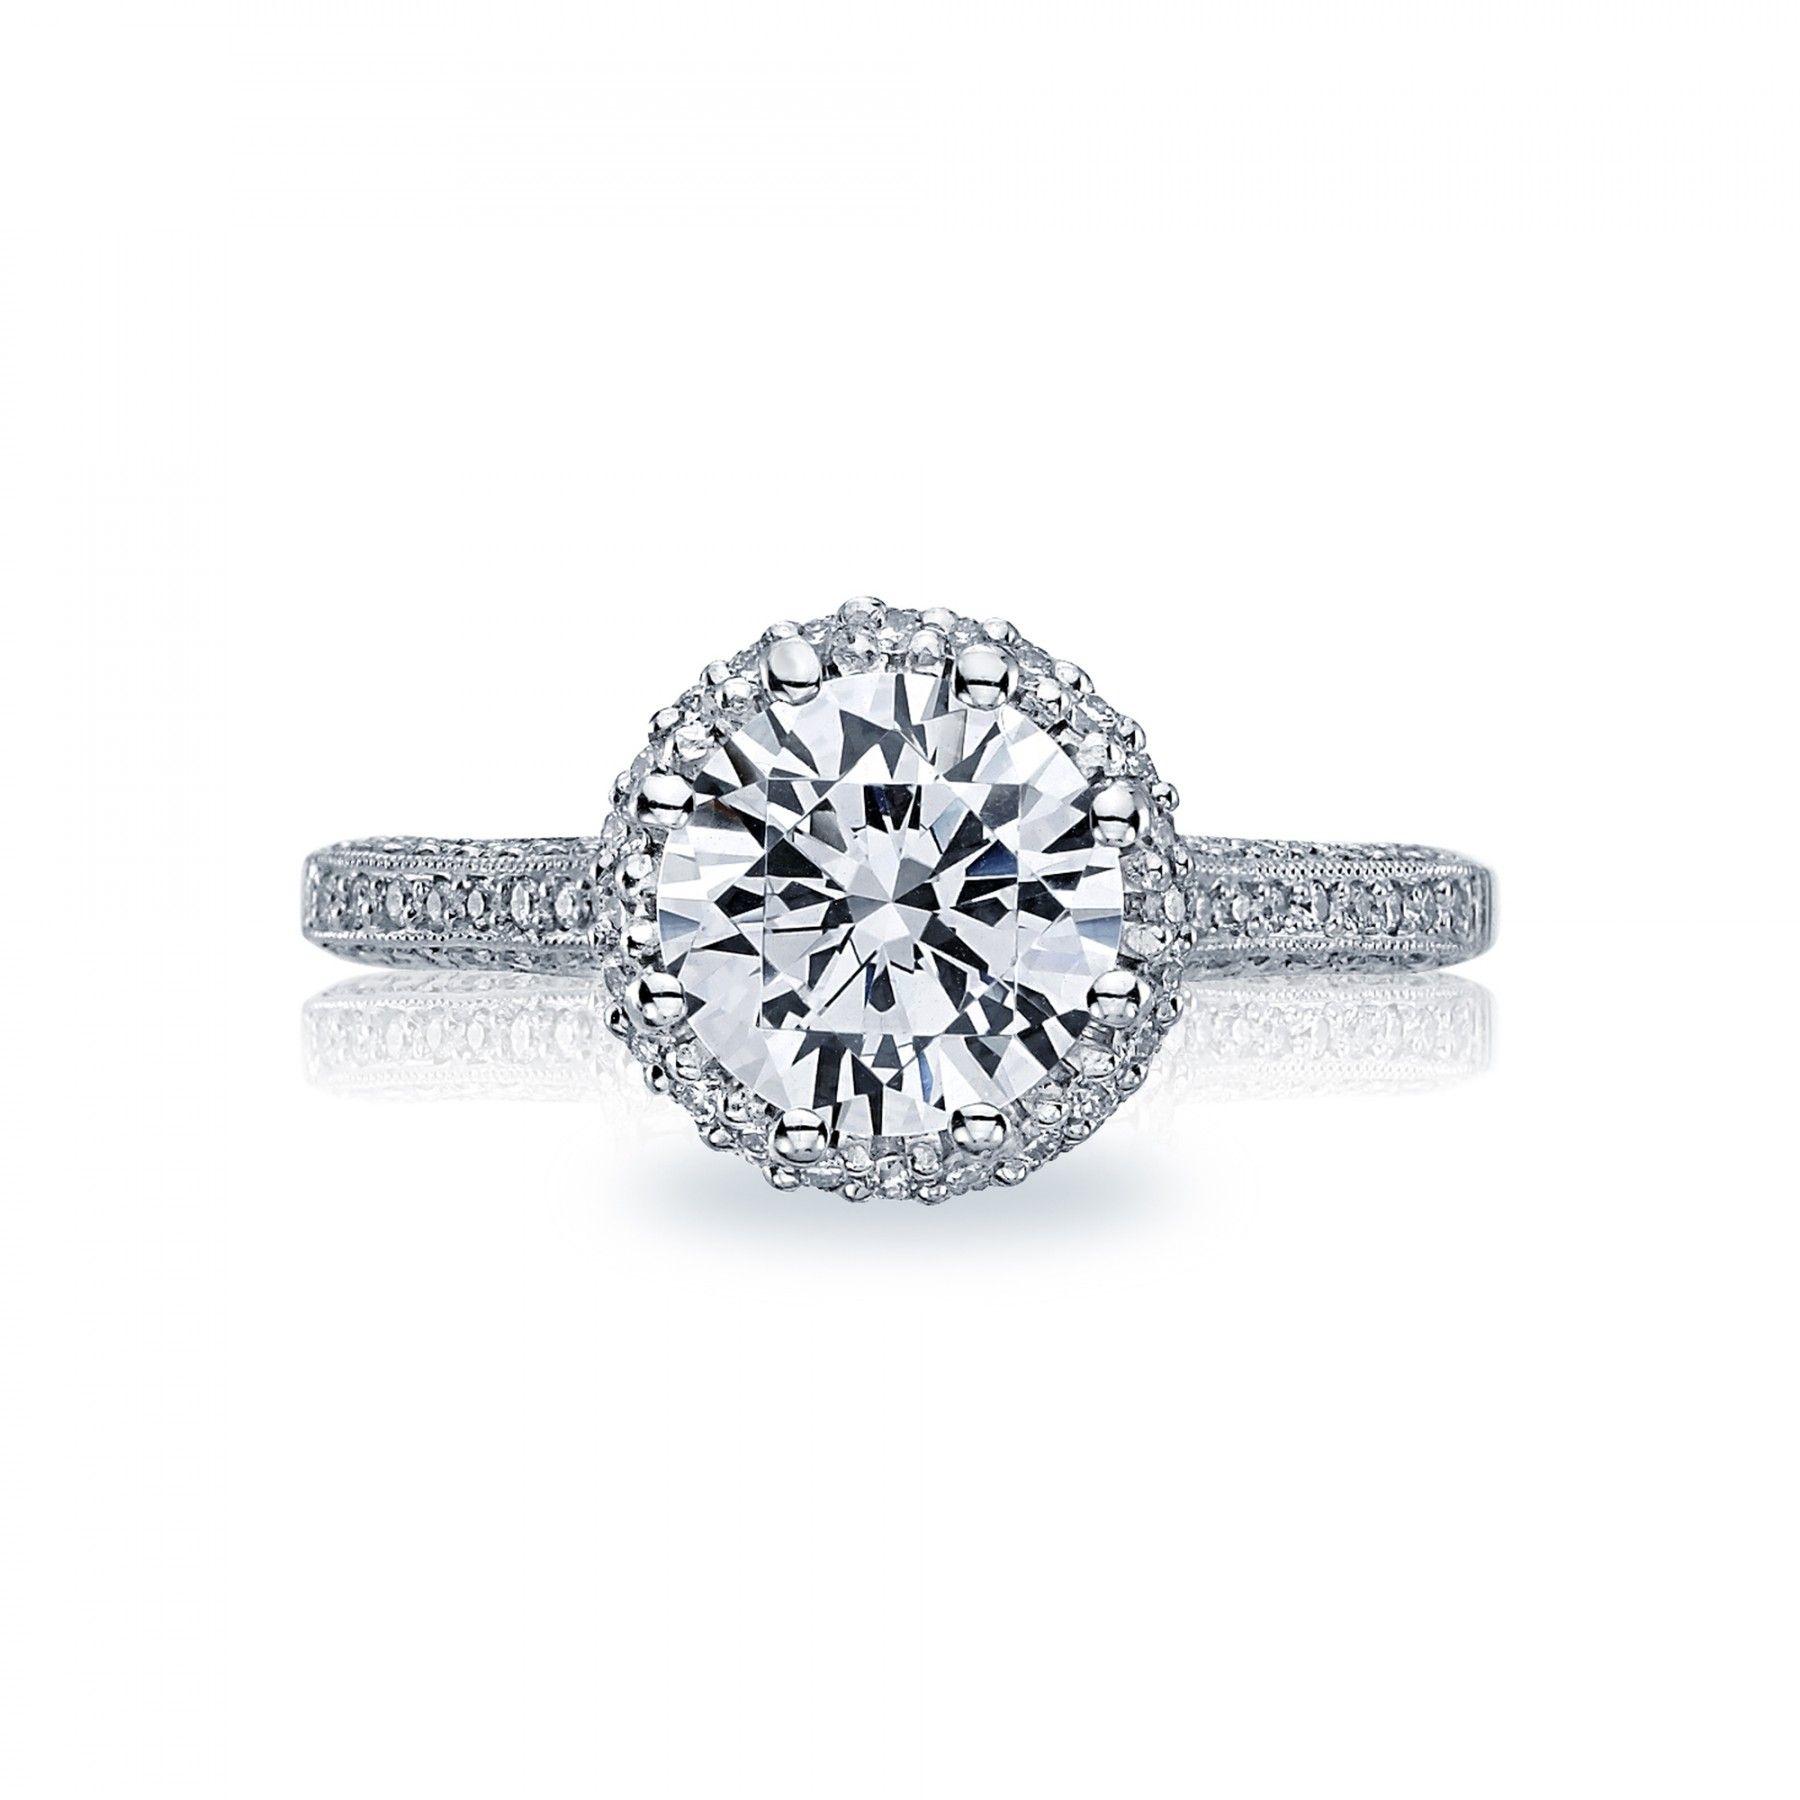 Style 2502RDP75 Simply Tacori Engagement Rings Tacori